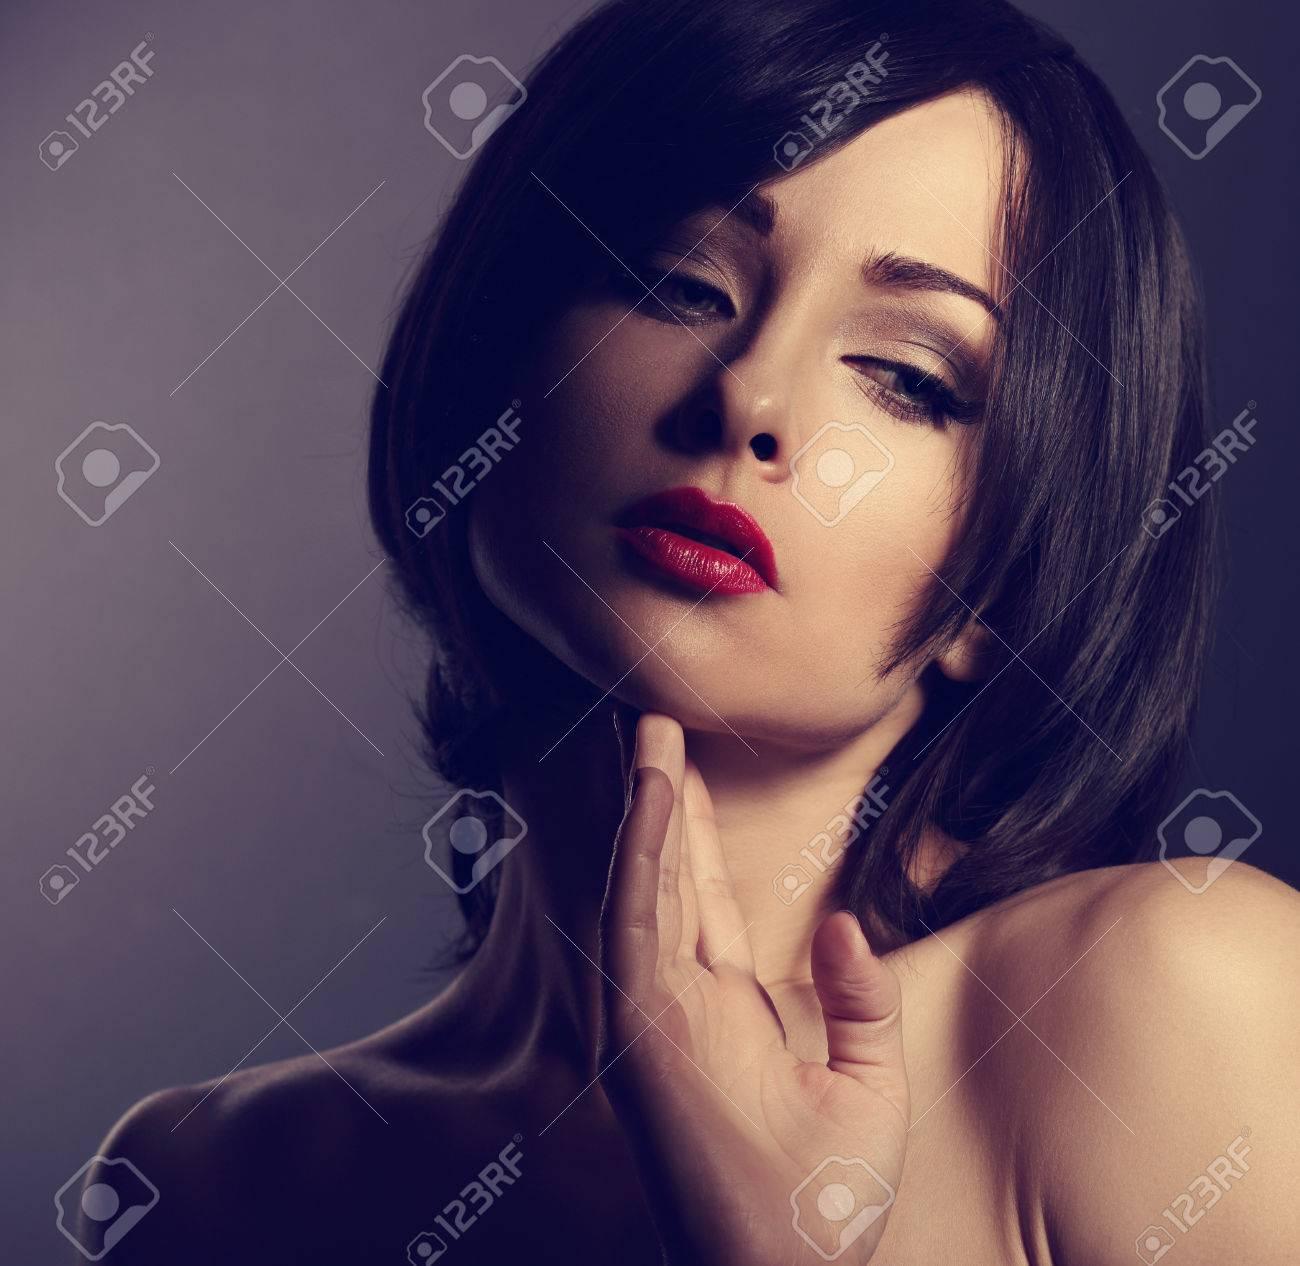 Japanese bukkake girl